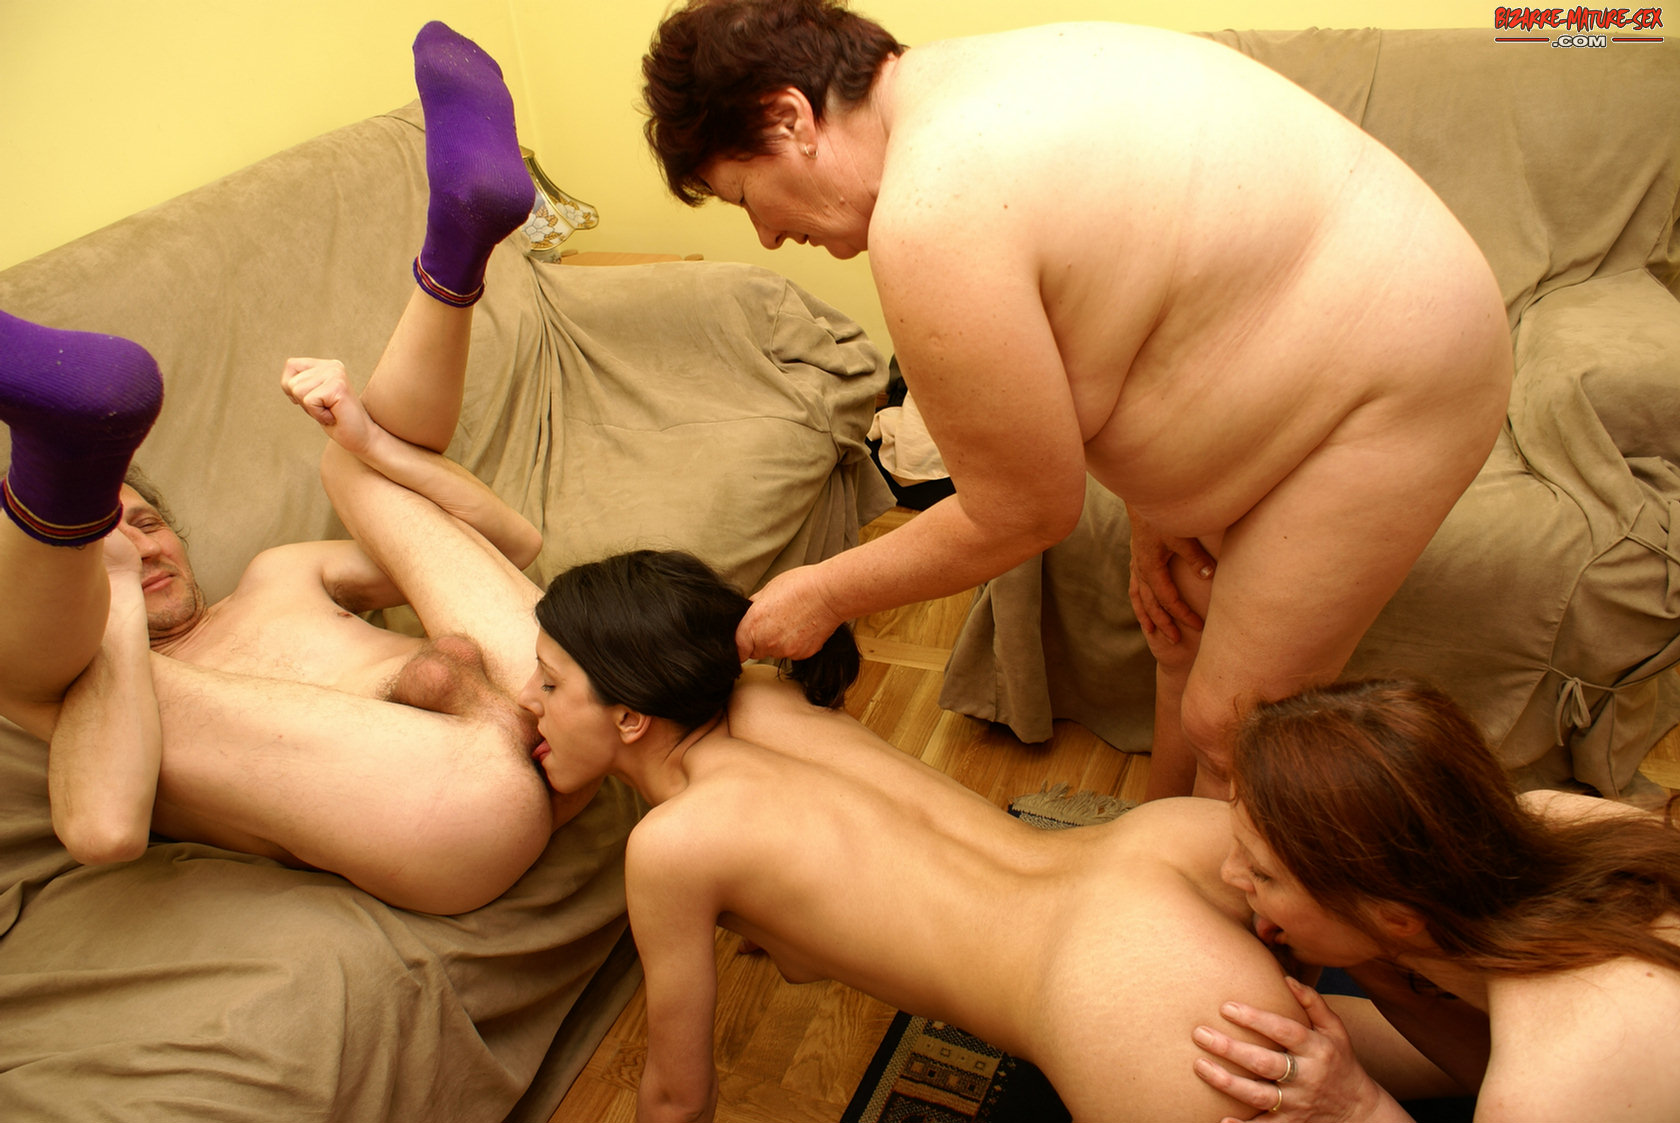 Nasty Girls Doing Not so Nasty Things - YouPorncom